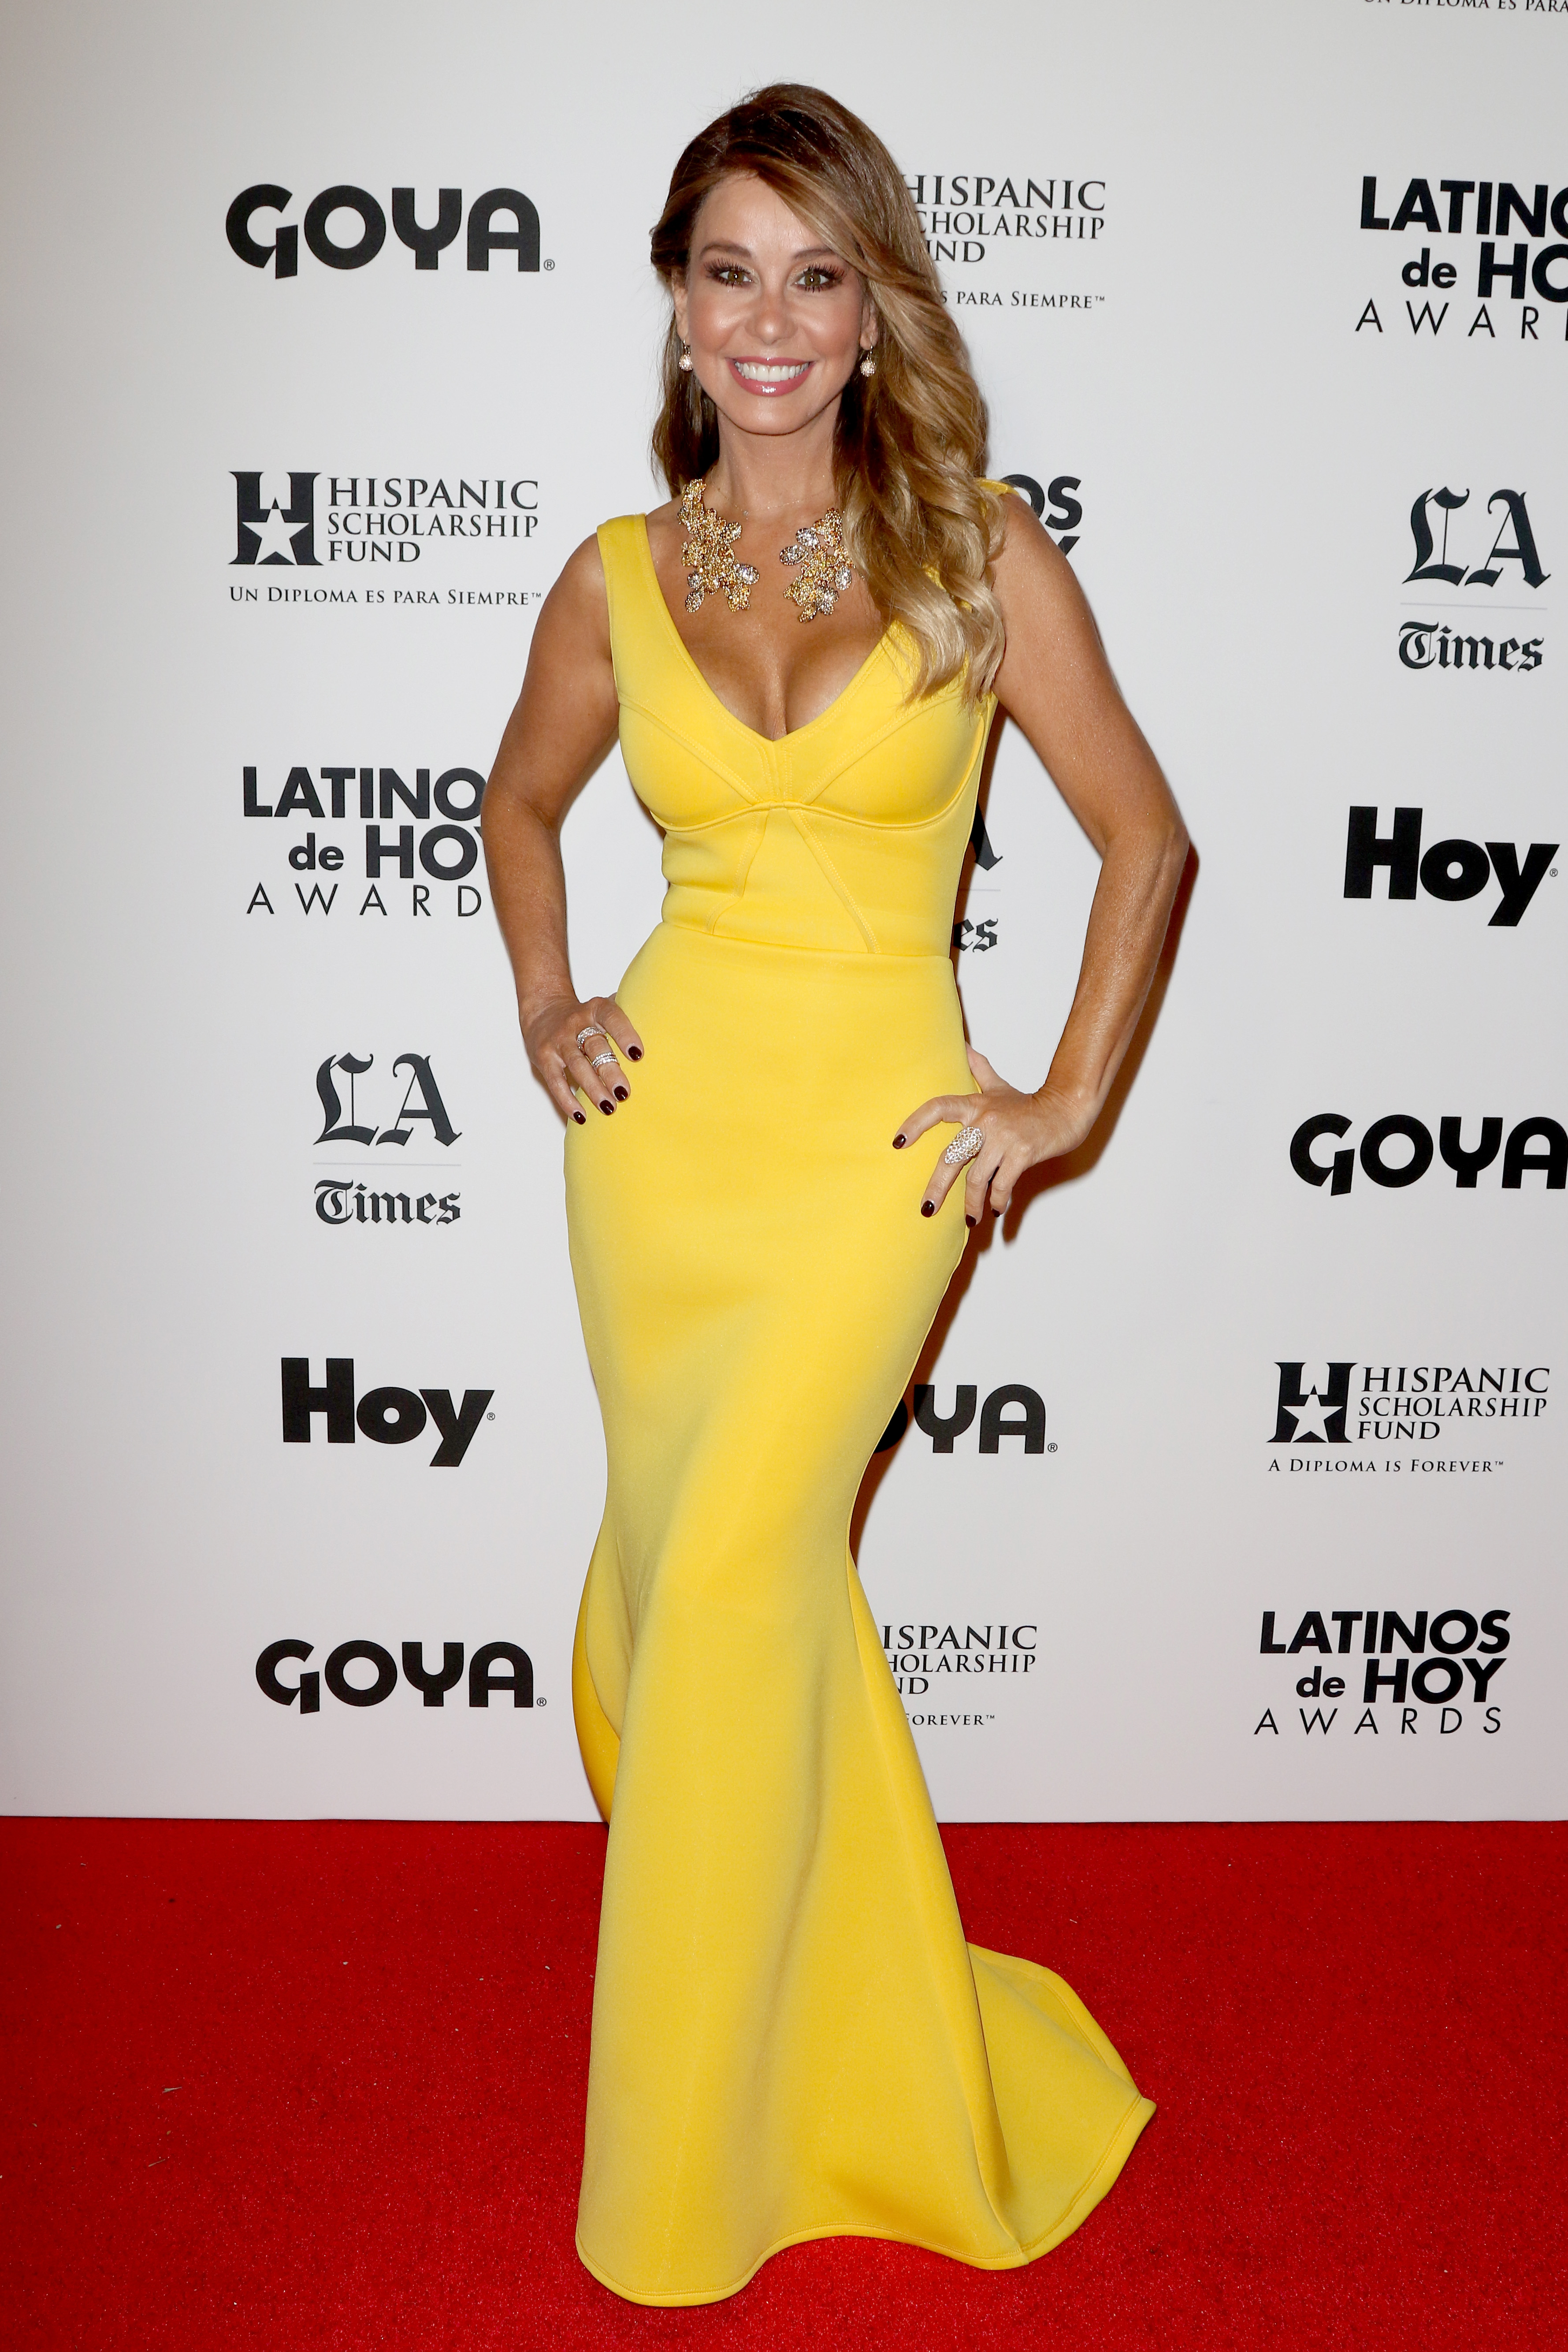 The Los Angeles Times And Hoy 2015 Latinos de Hoy Awards